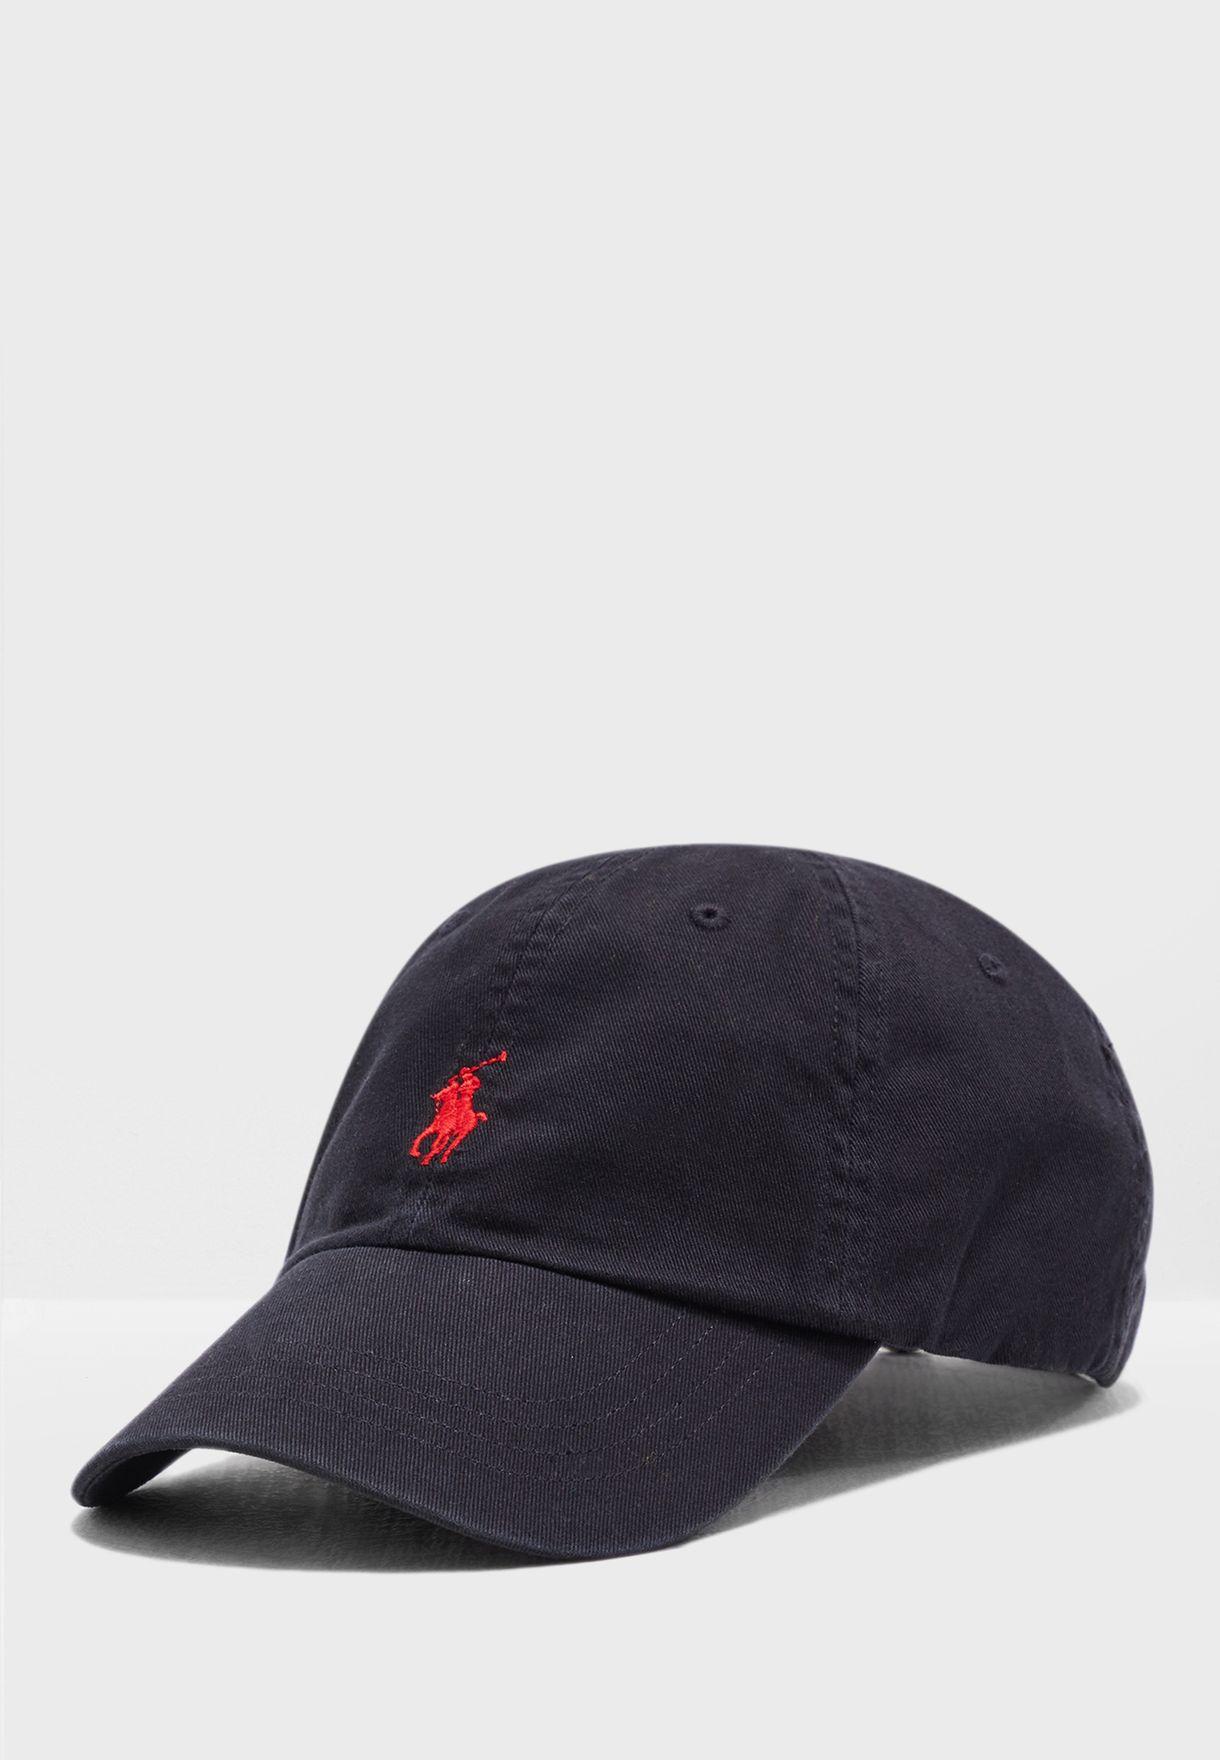 e89fb74cb35 Shop Polo Ralph Lauren black Cotton Chino Baseball Cap 7.10549E+11 ...